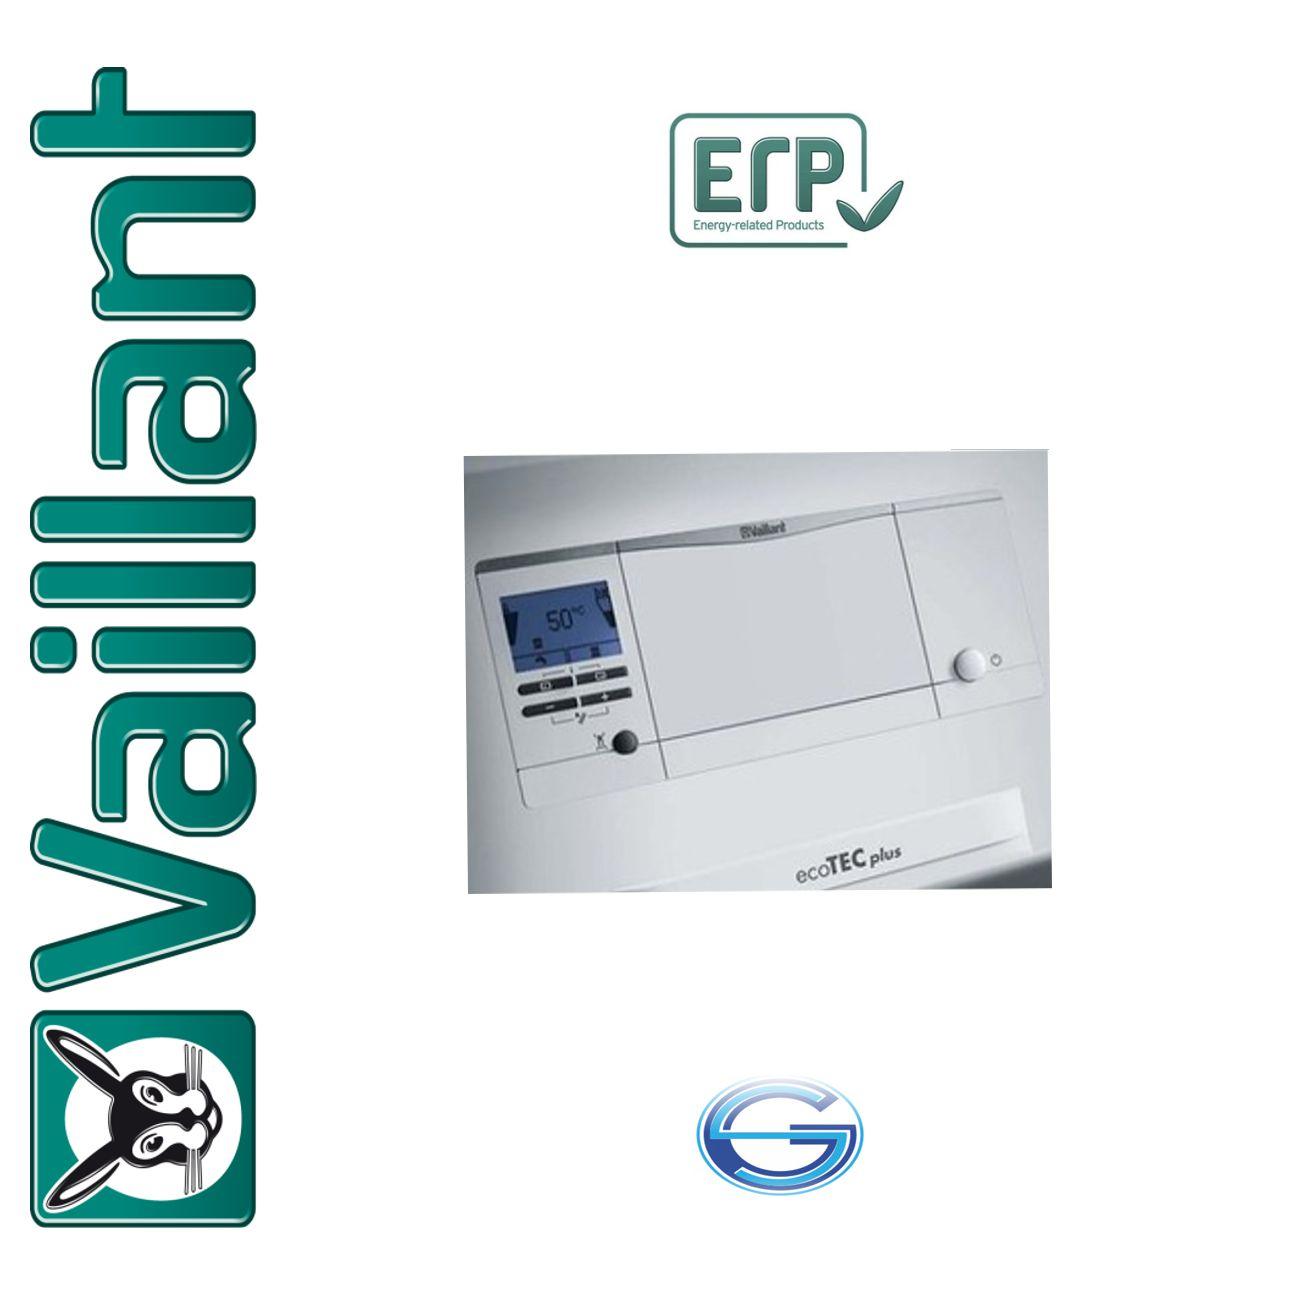 Caldera de gas condensación Vaillant ecoTEC plus VMW ErP panel de mandos